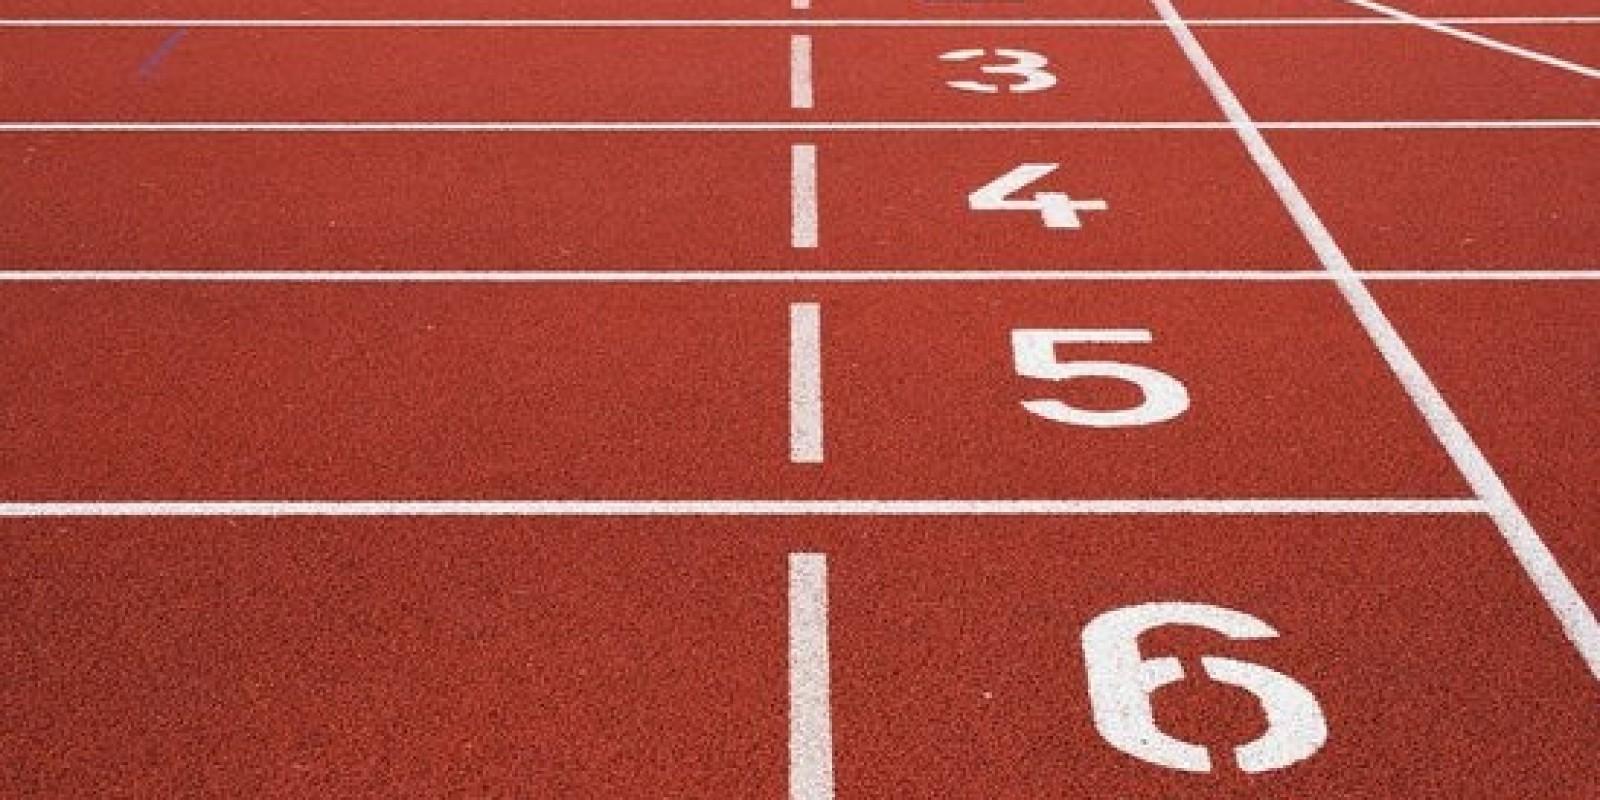 Campeonato Cerbranorte de Atletismo acontece nesta sexta-feira